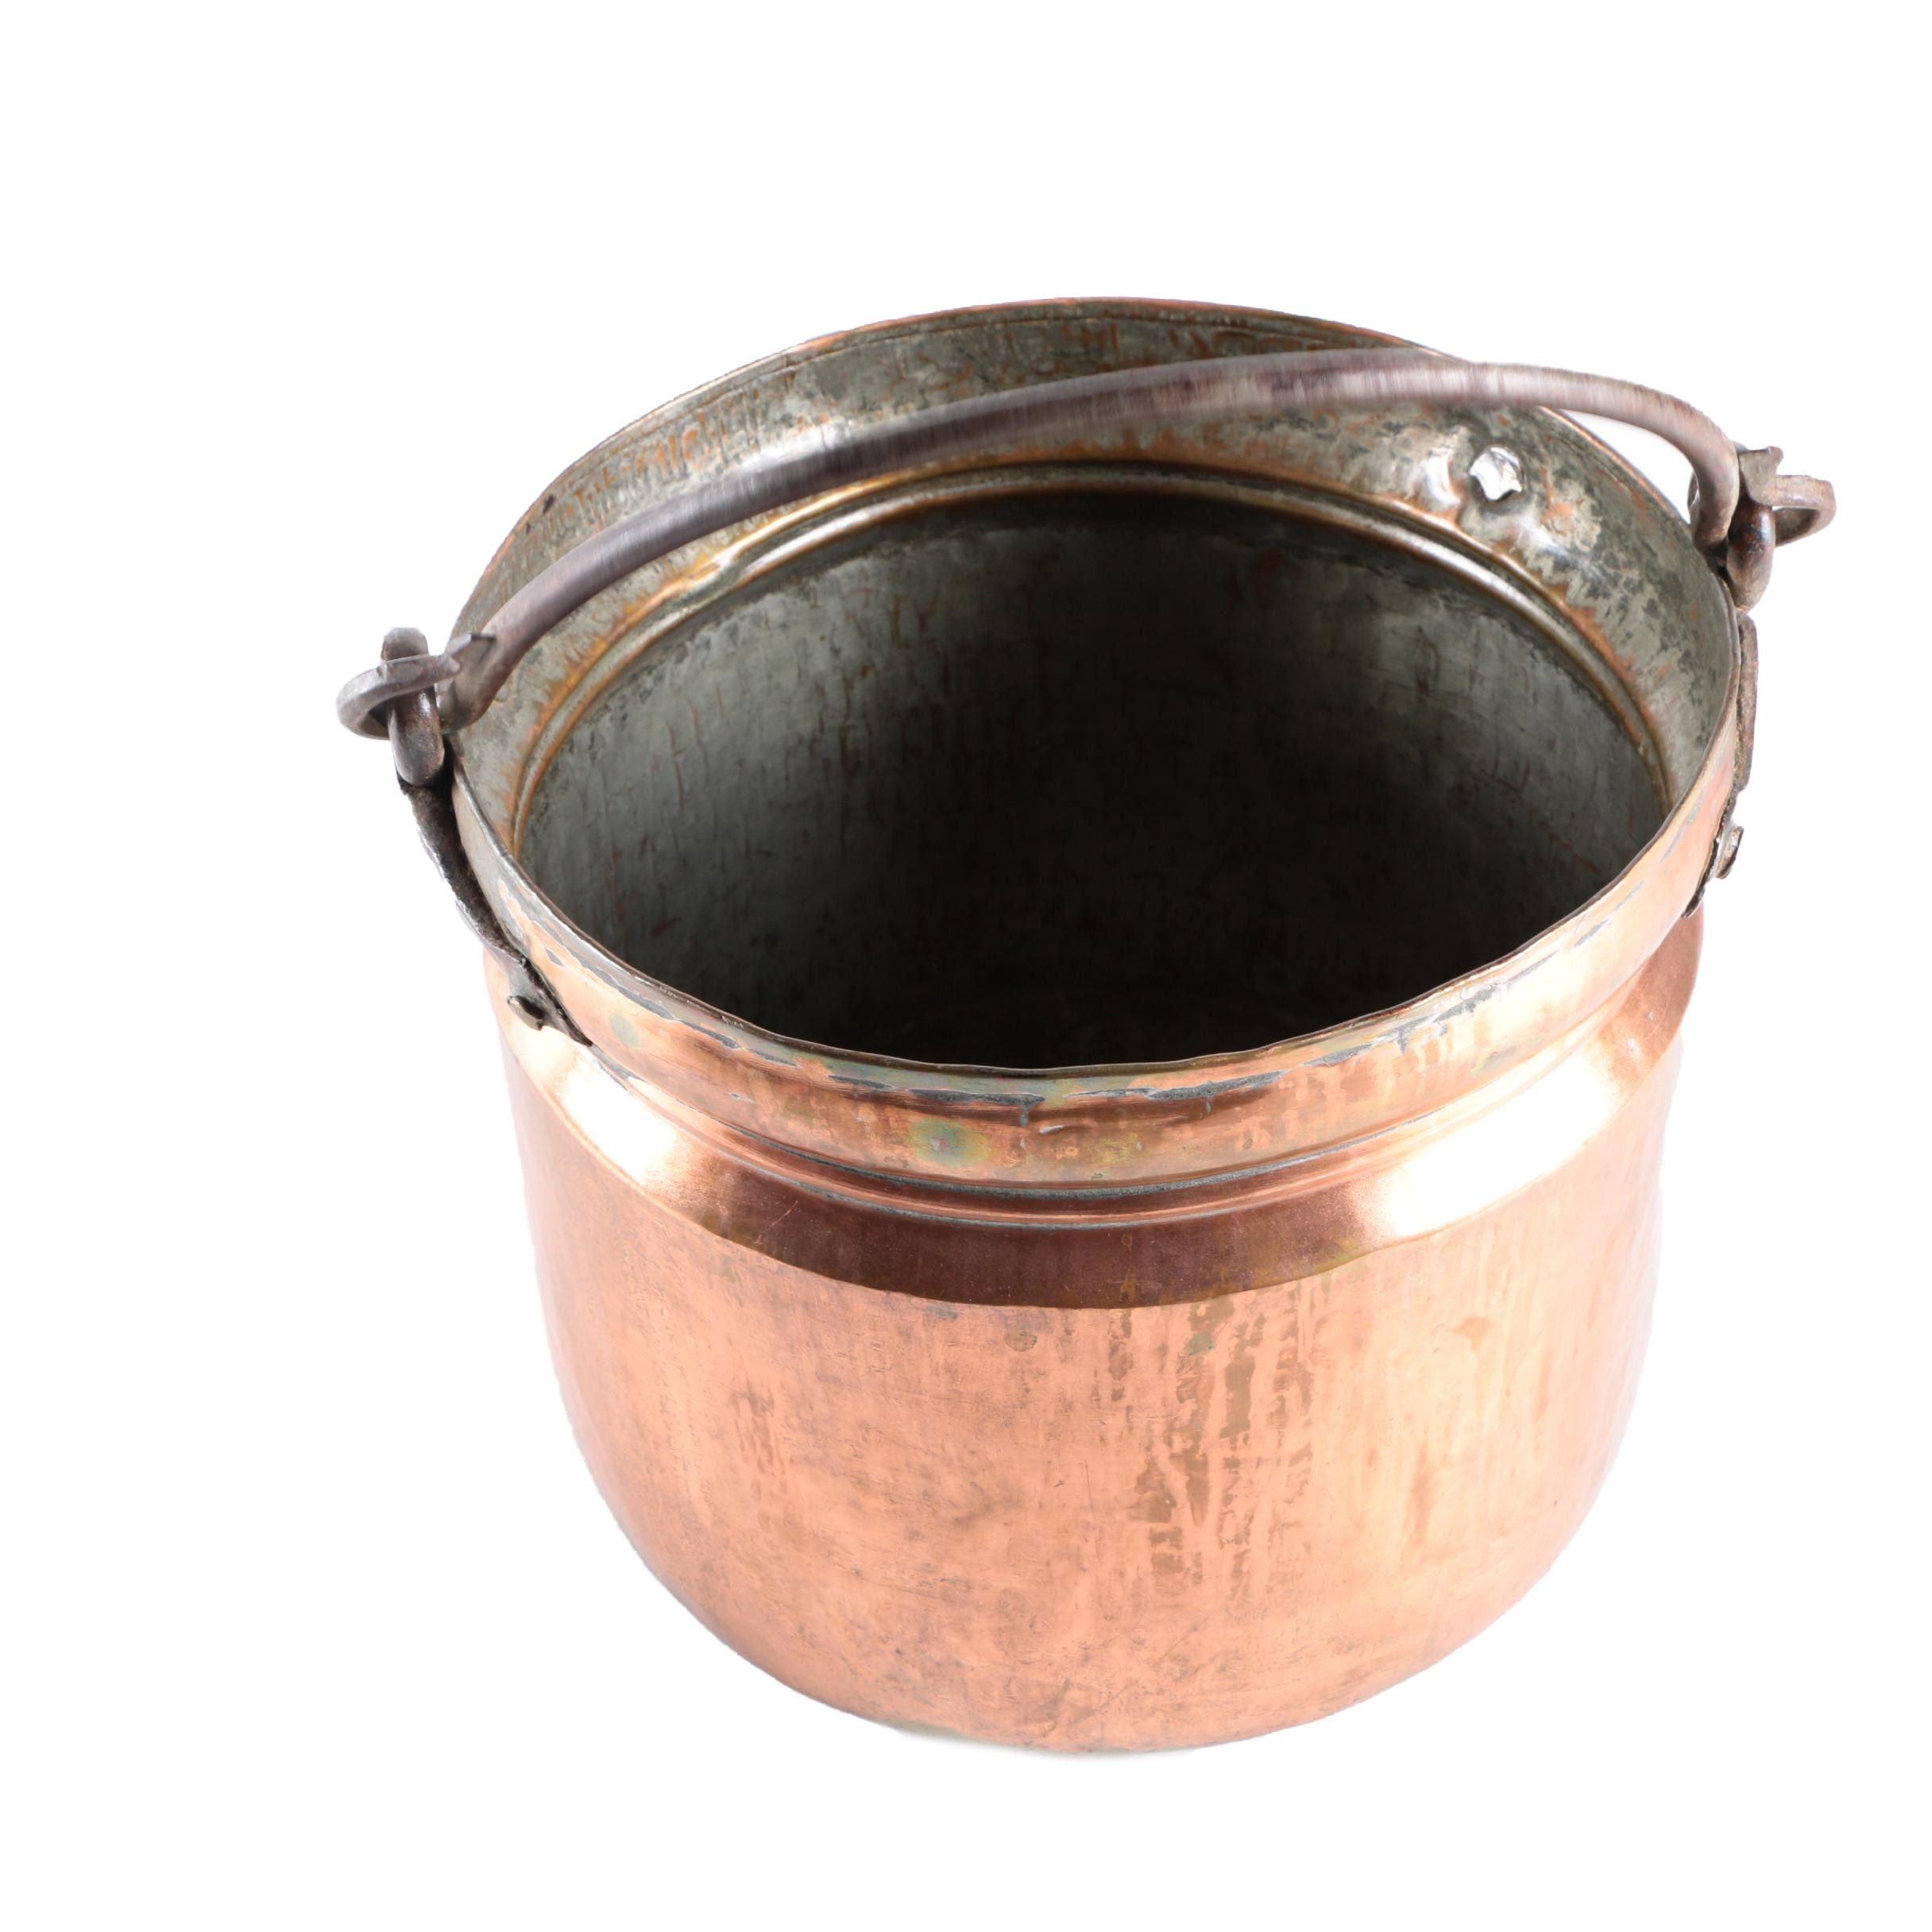 Turkish Hammered Copper Pail